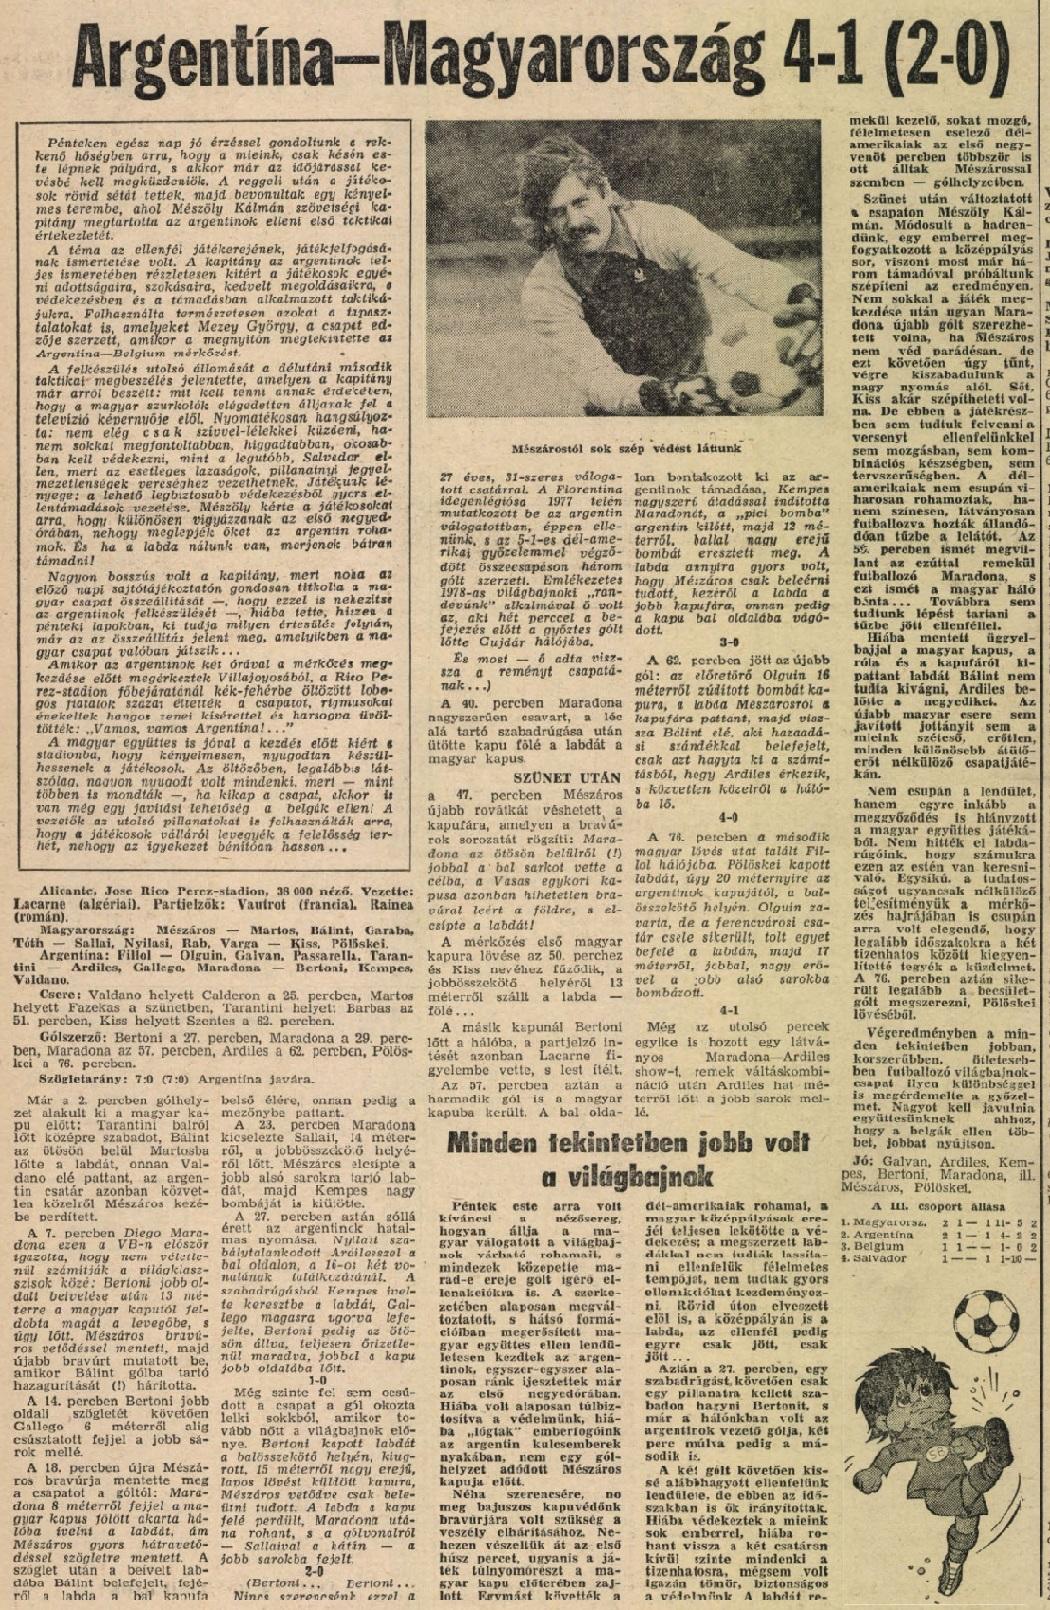 idokapszula_1982_spanyolorszagi_labdarugo_vilagbajnoksag_argentina_magyarorszag_merkozes.jpg